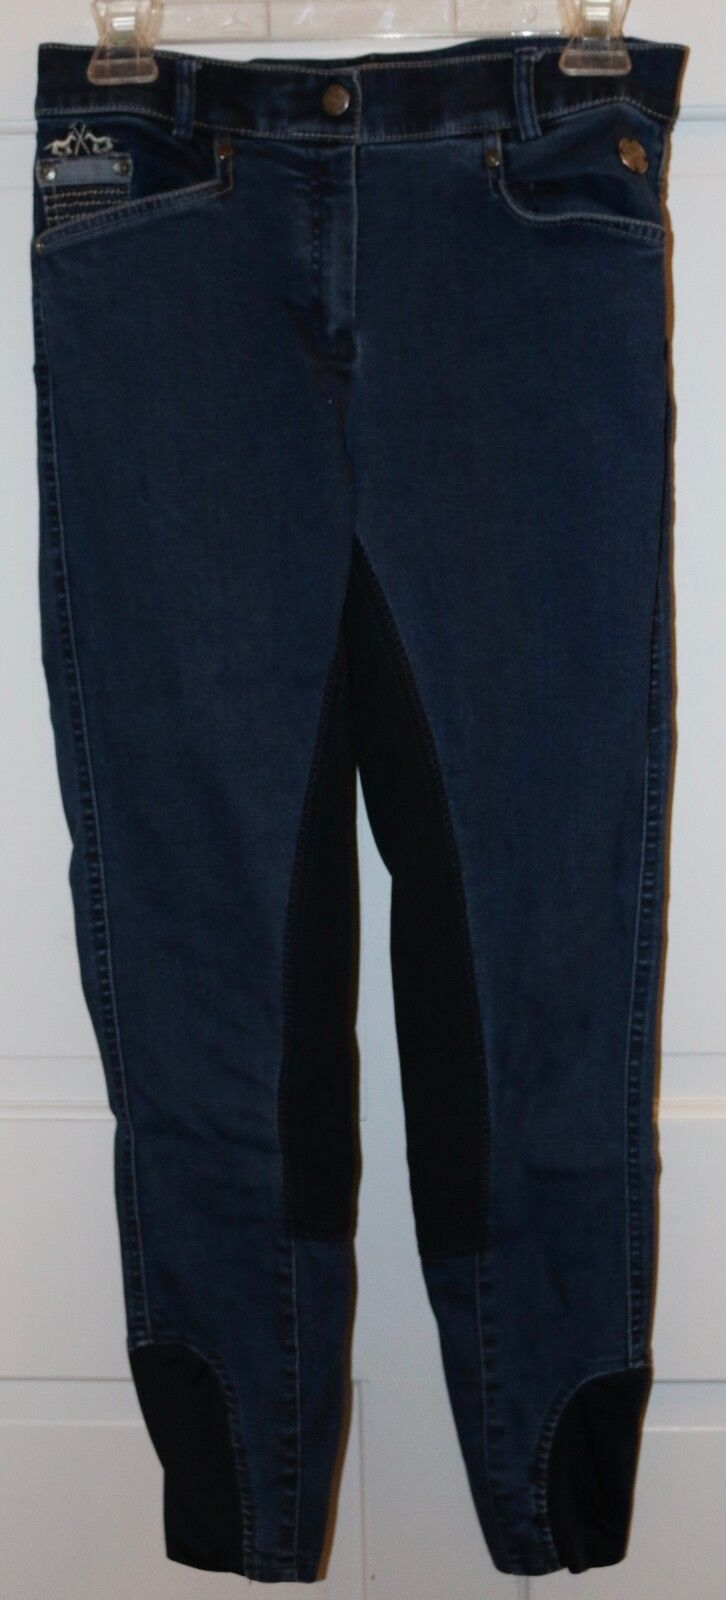 HV Polo European FULL SEAT BREECHES bluee Jeans Denim Size 26 26R Dressage EUC